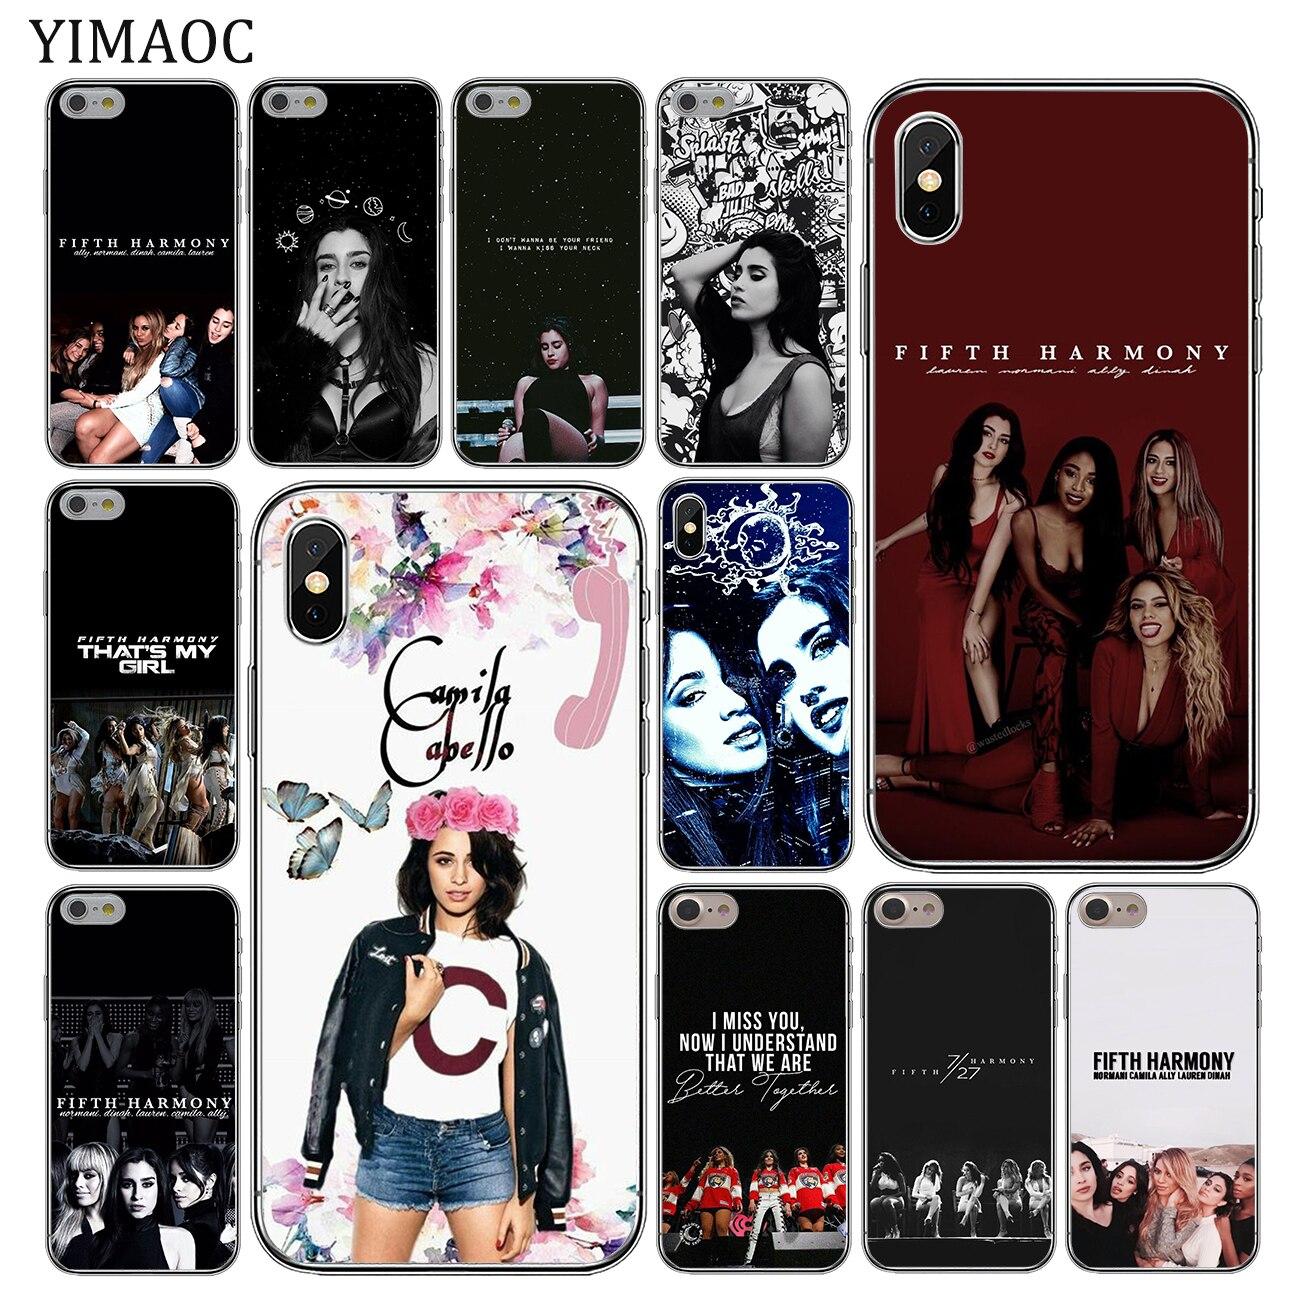 2cae615f55c YIMAOC Camila Cabello Fifth Harmony Soft Silicone Phone Case for Apple  iPhone XS